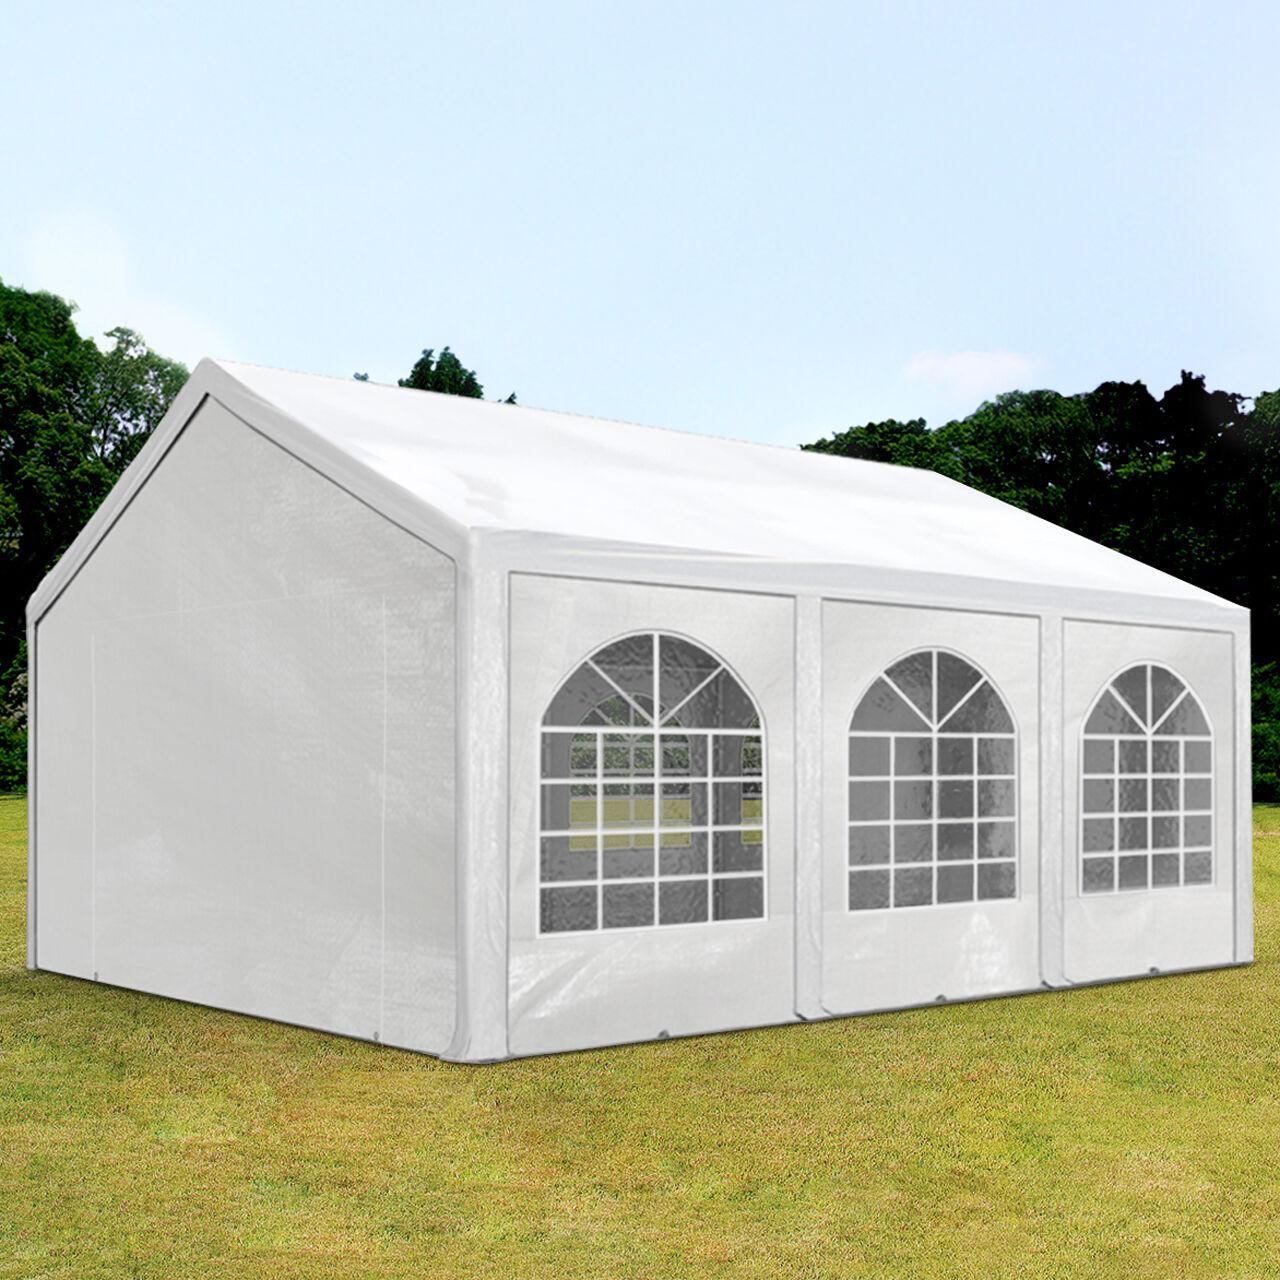 TOOLPORT Marquee 3x6m PE 240g/m² white waterproof